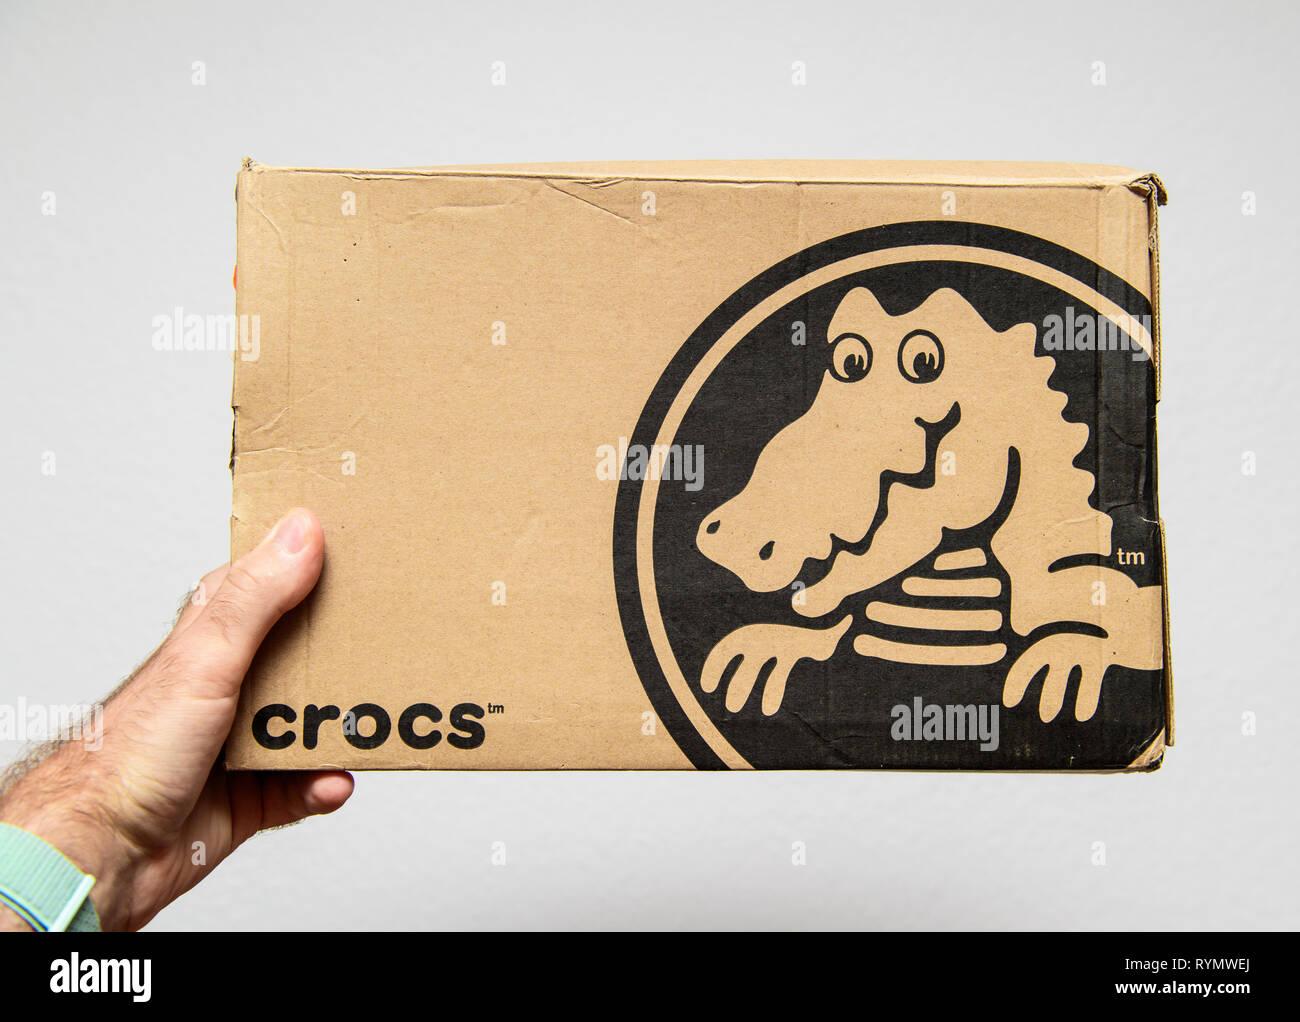 Paris, France - Jun 12, 2018: Man hand holding Freshly delivered Crocs shoes cardboard box featuring big crocodile logotype white background - Stock Image